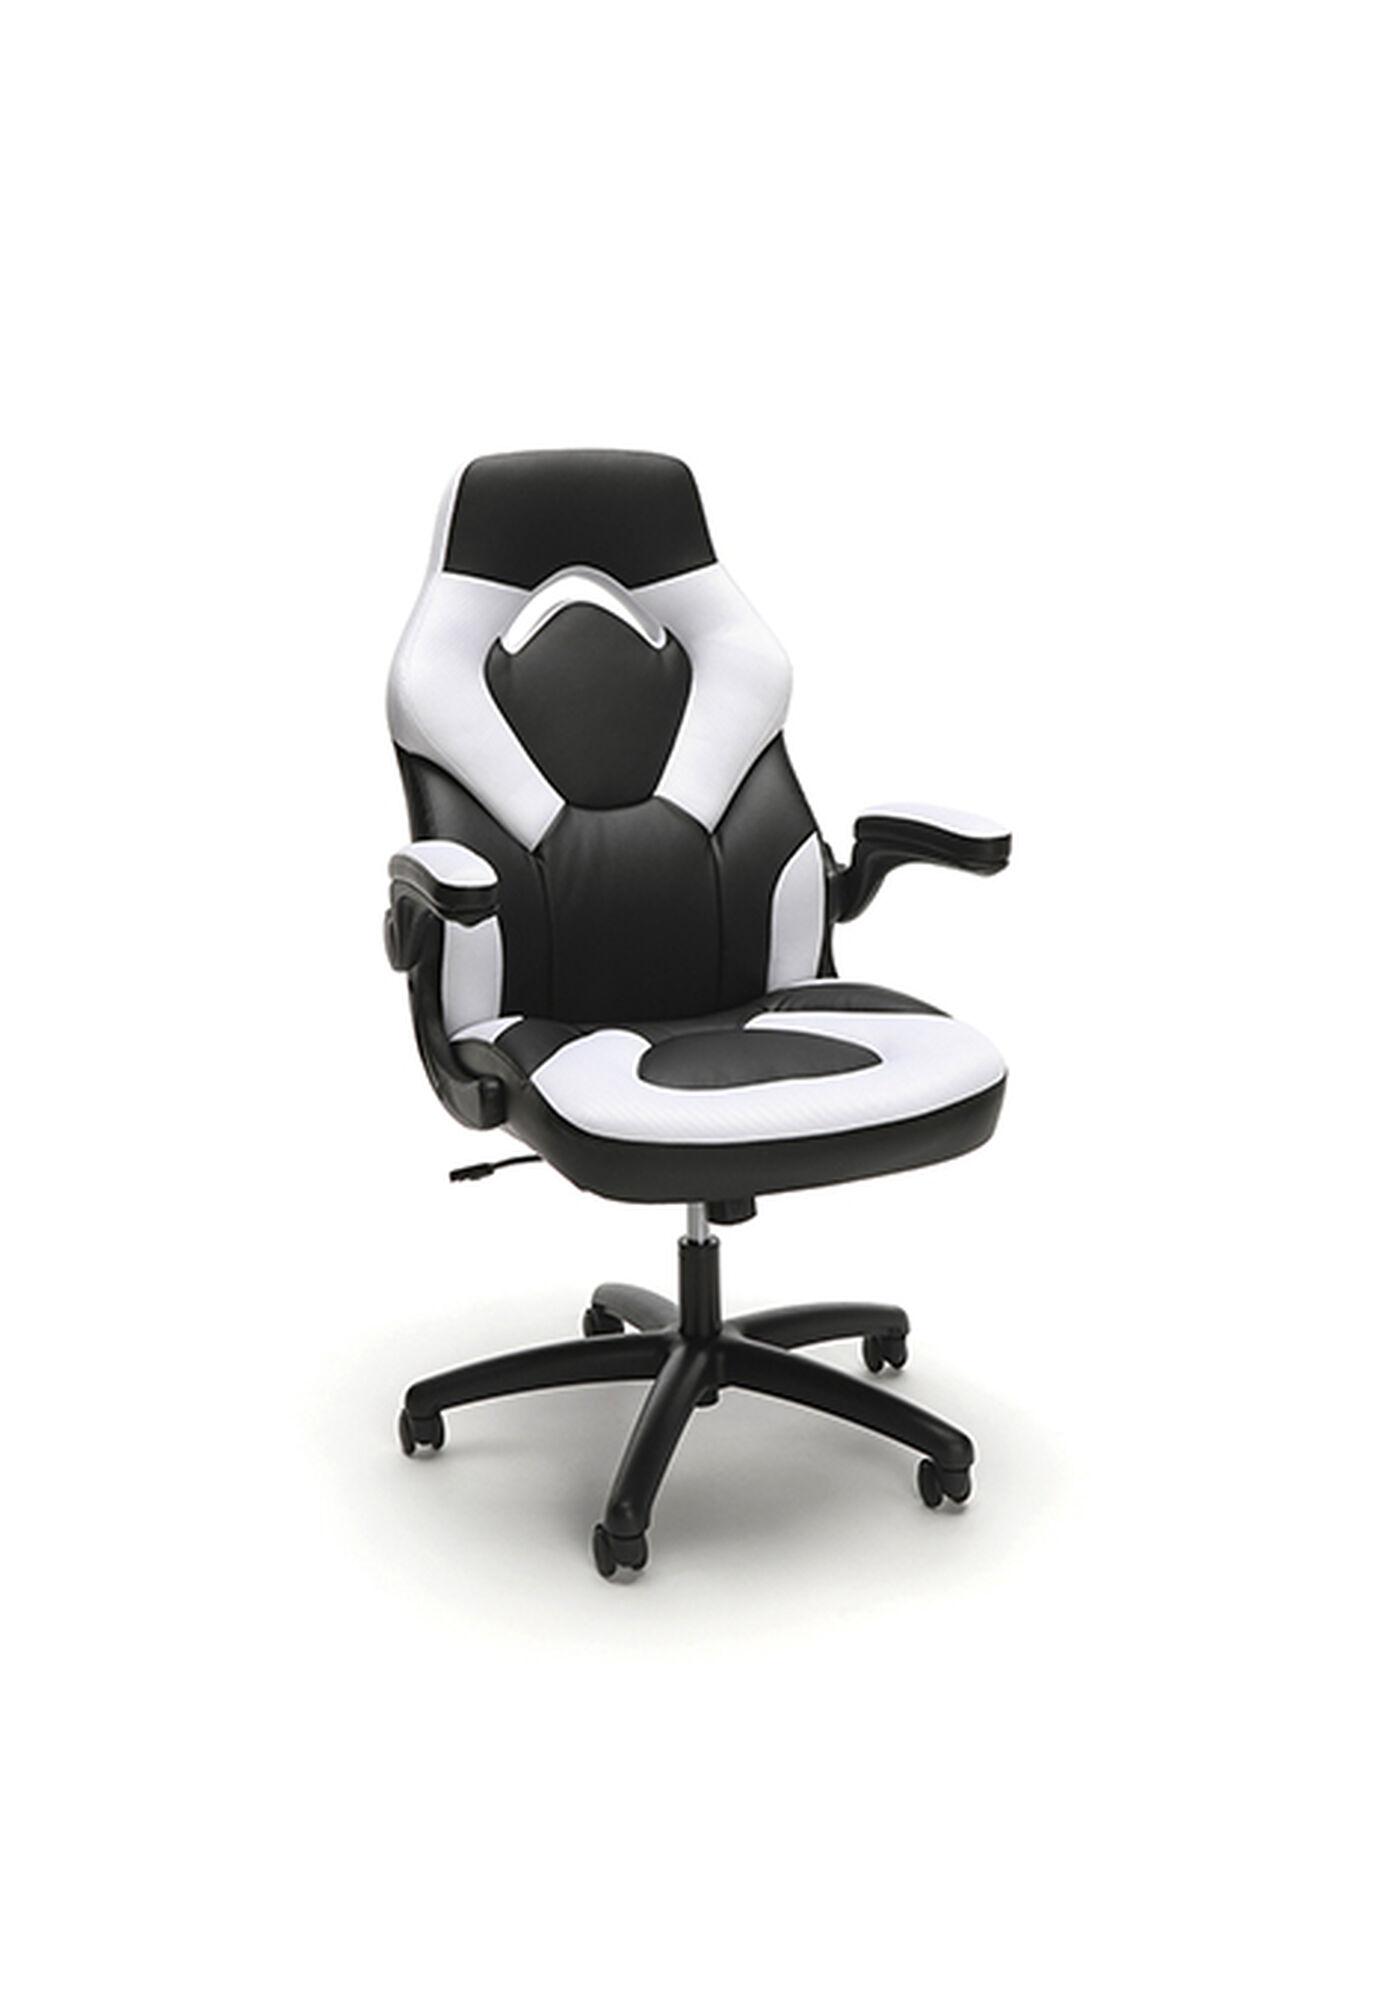 Leather Gaming Chair White Ess 3085 Wht Bizchair Com